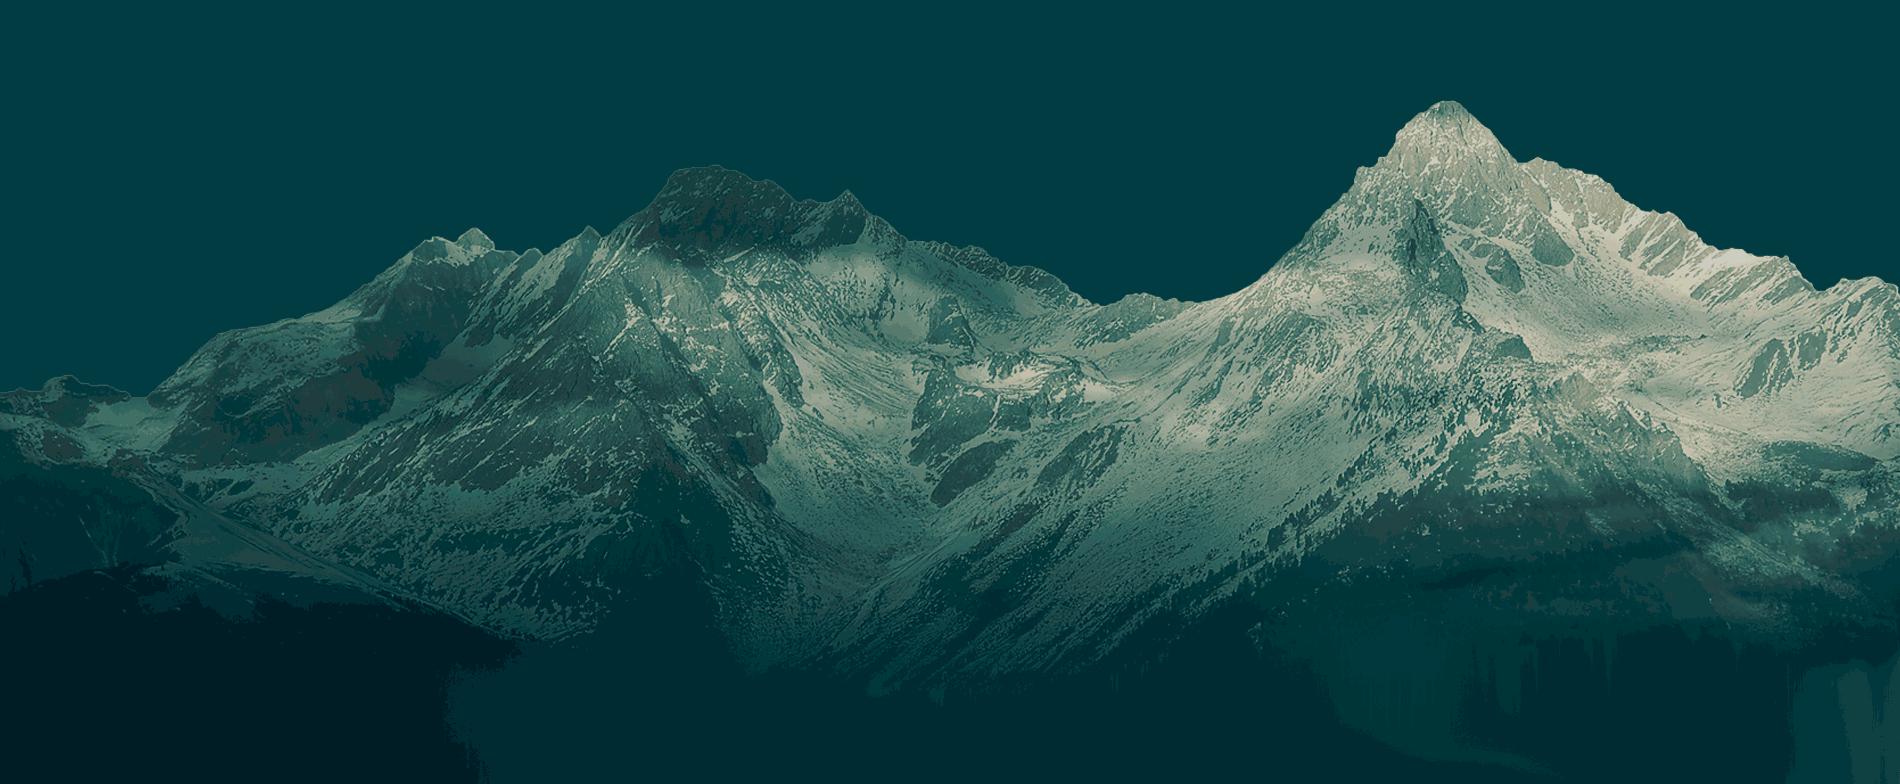 Mountain Ridge clipart transparent PNG mountain Mountains images Mountain